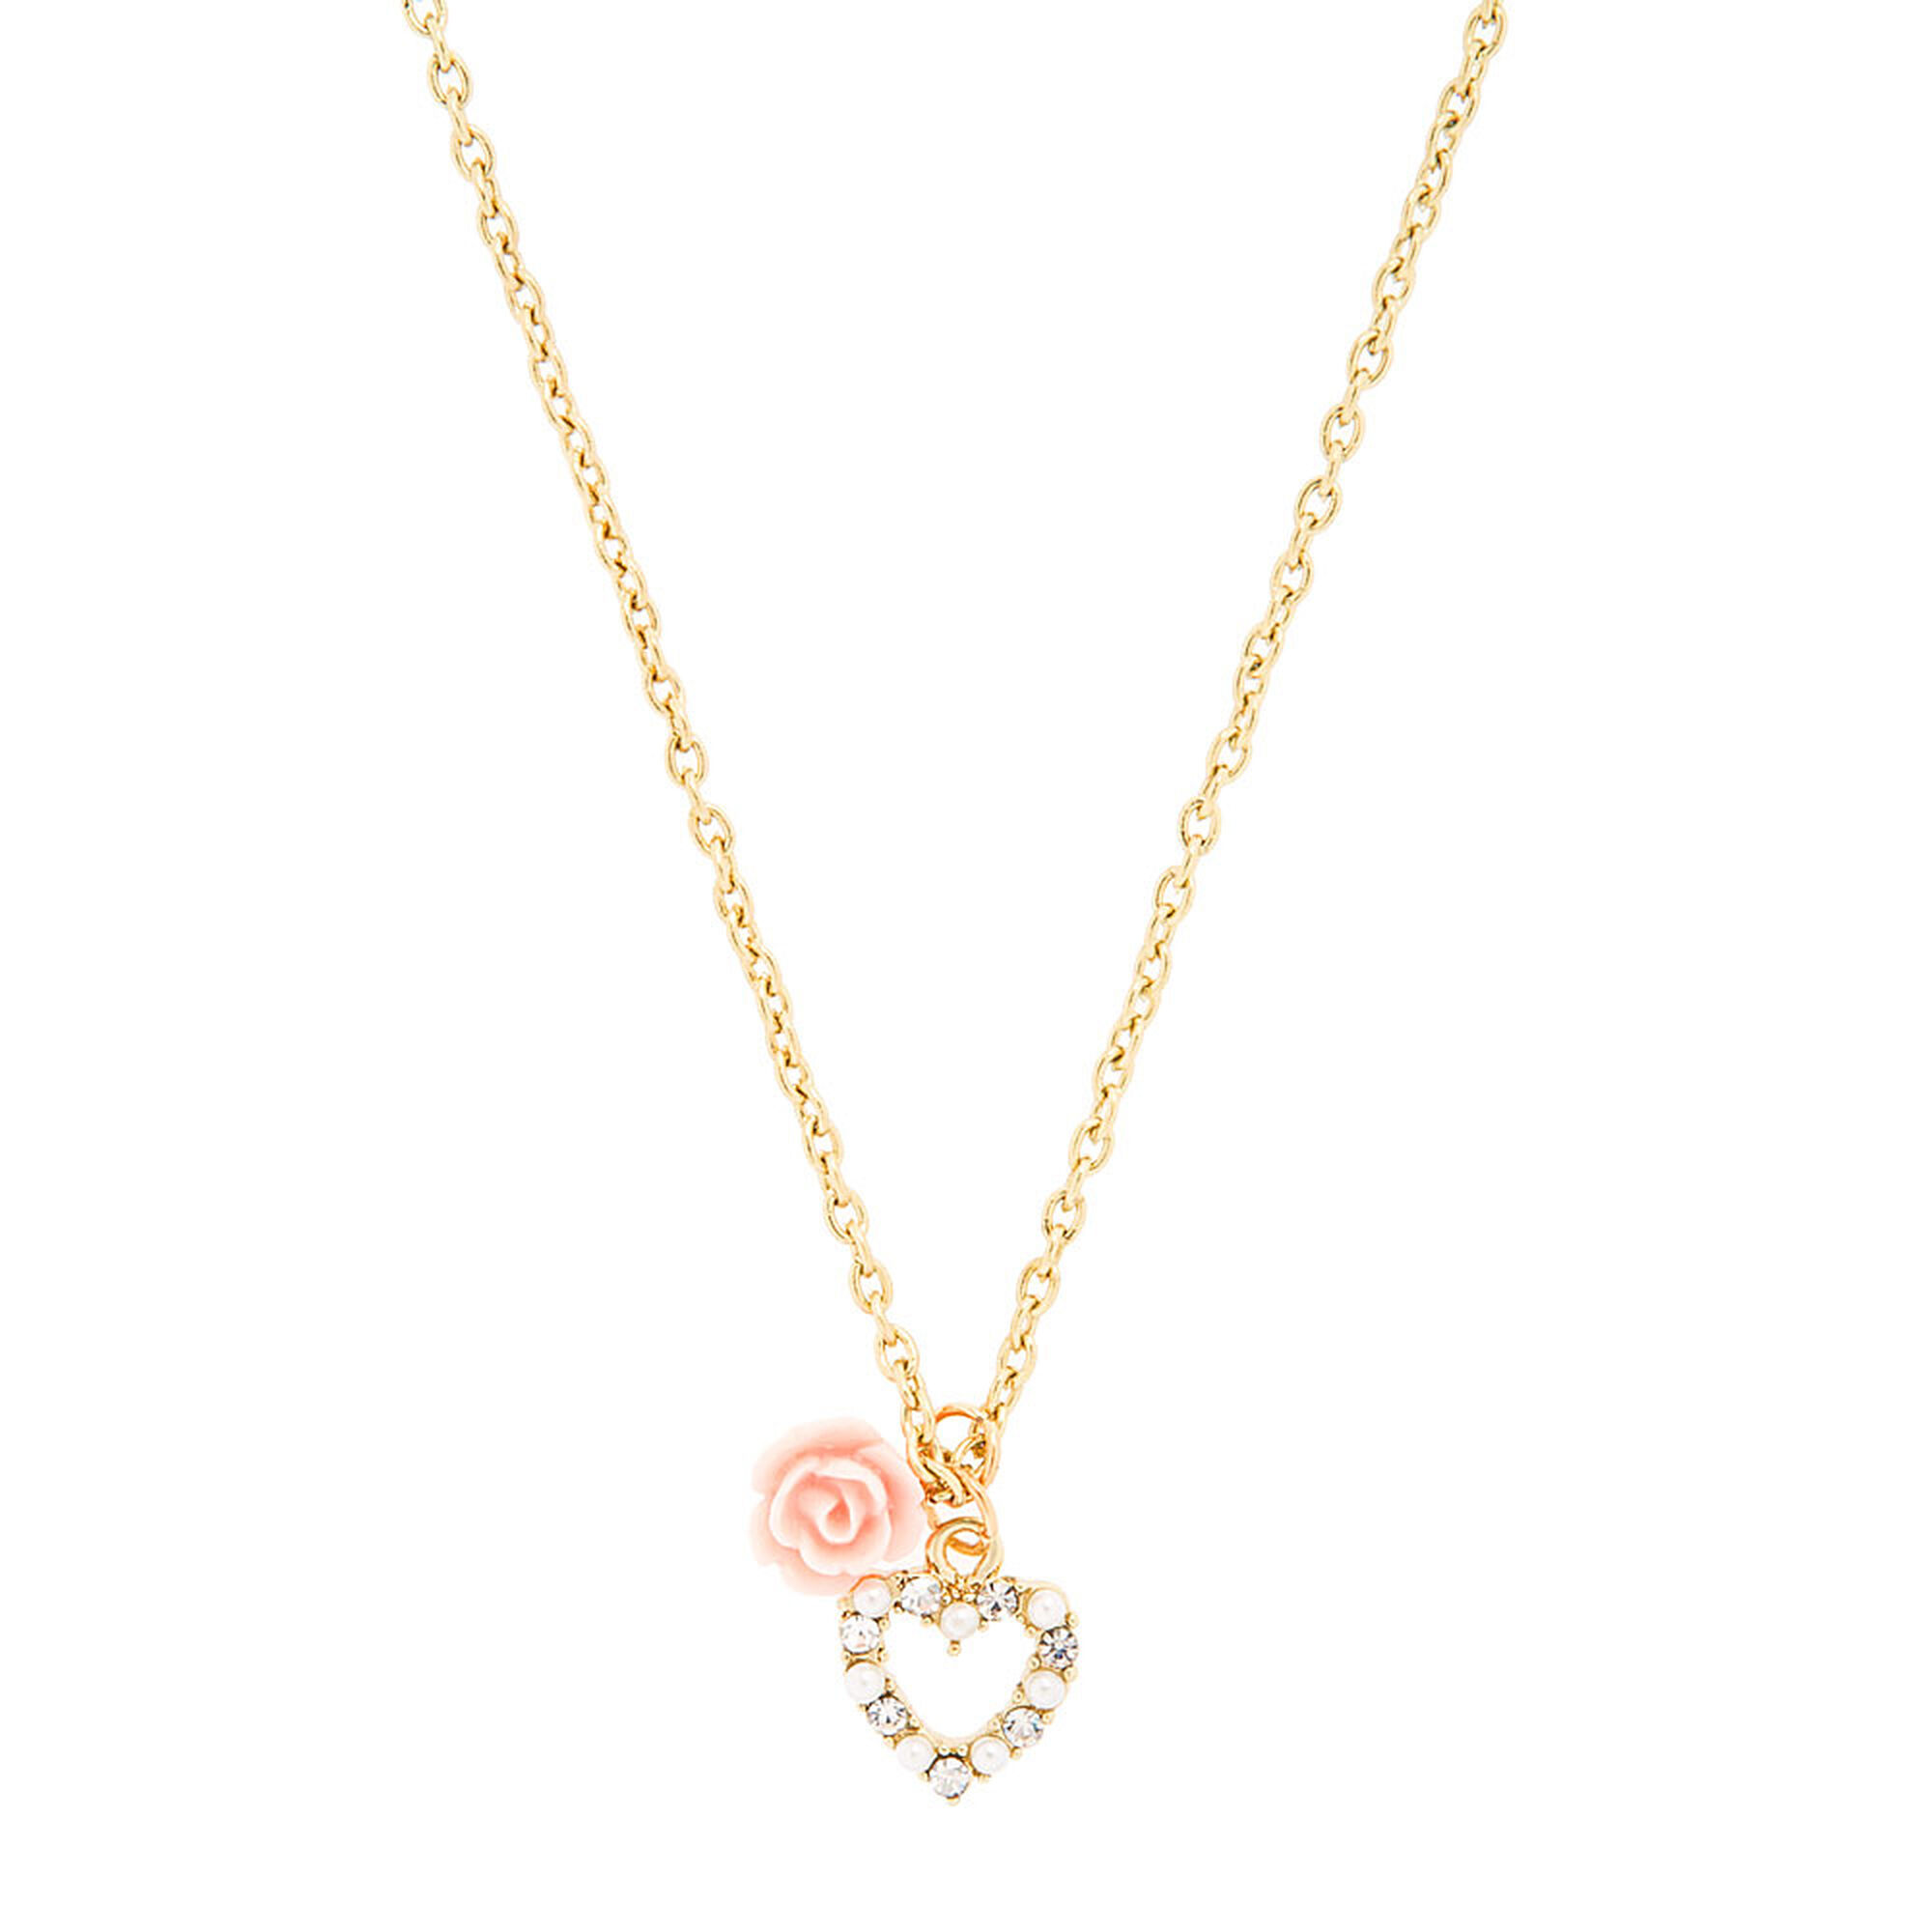 jewelry sapphire eden shop necklace gold sparkly rose handmade necklaces reija grey